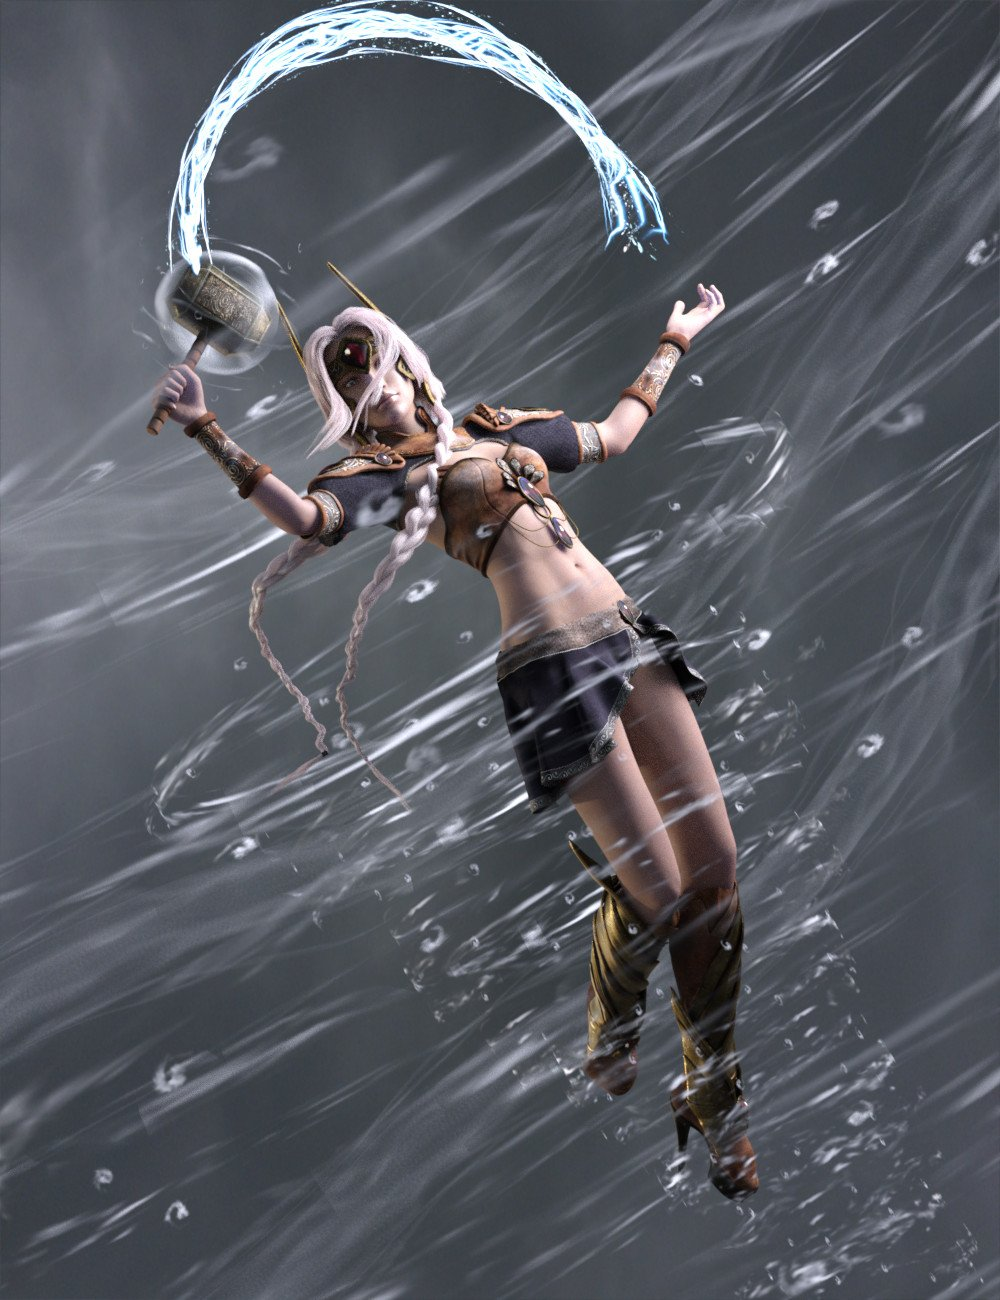 FSL Elements of Magic by: Fuseling, 3D Models by Daz 3D